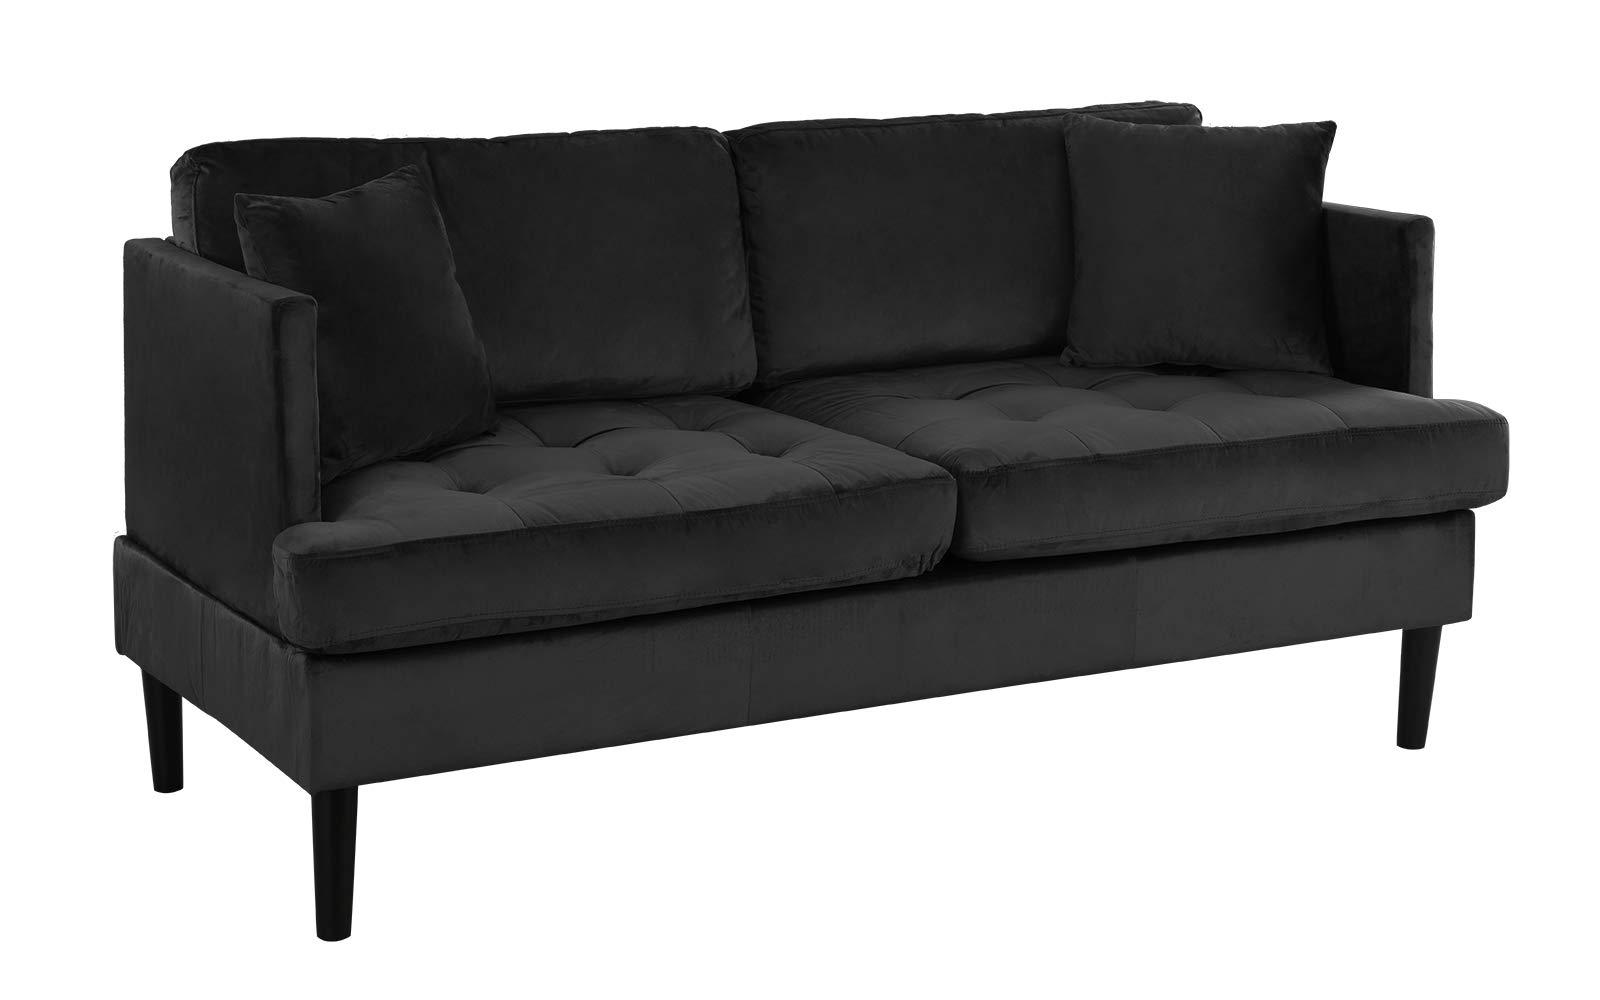 Mid Century Modern Velvet Loveseat Sofa with Tufted Seats (Black) by Casa Andrea Milano